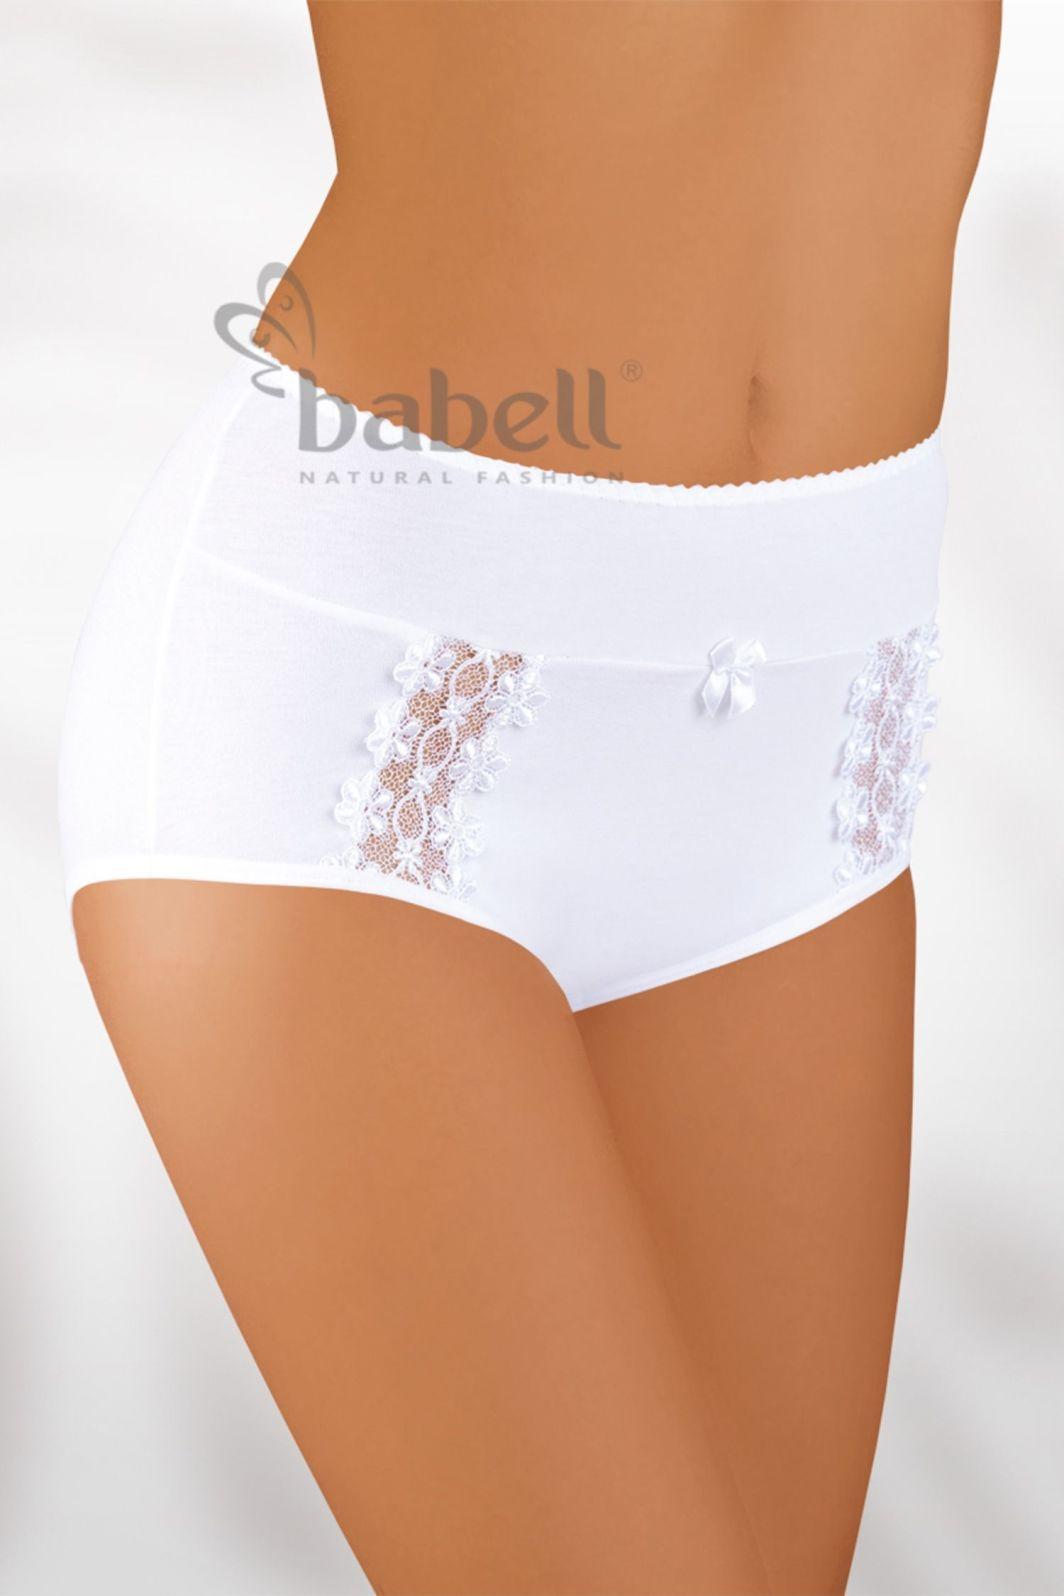 Babell Figi damskie BBL-005 plus białe r. 3XL 1